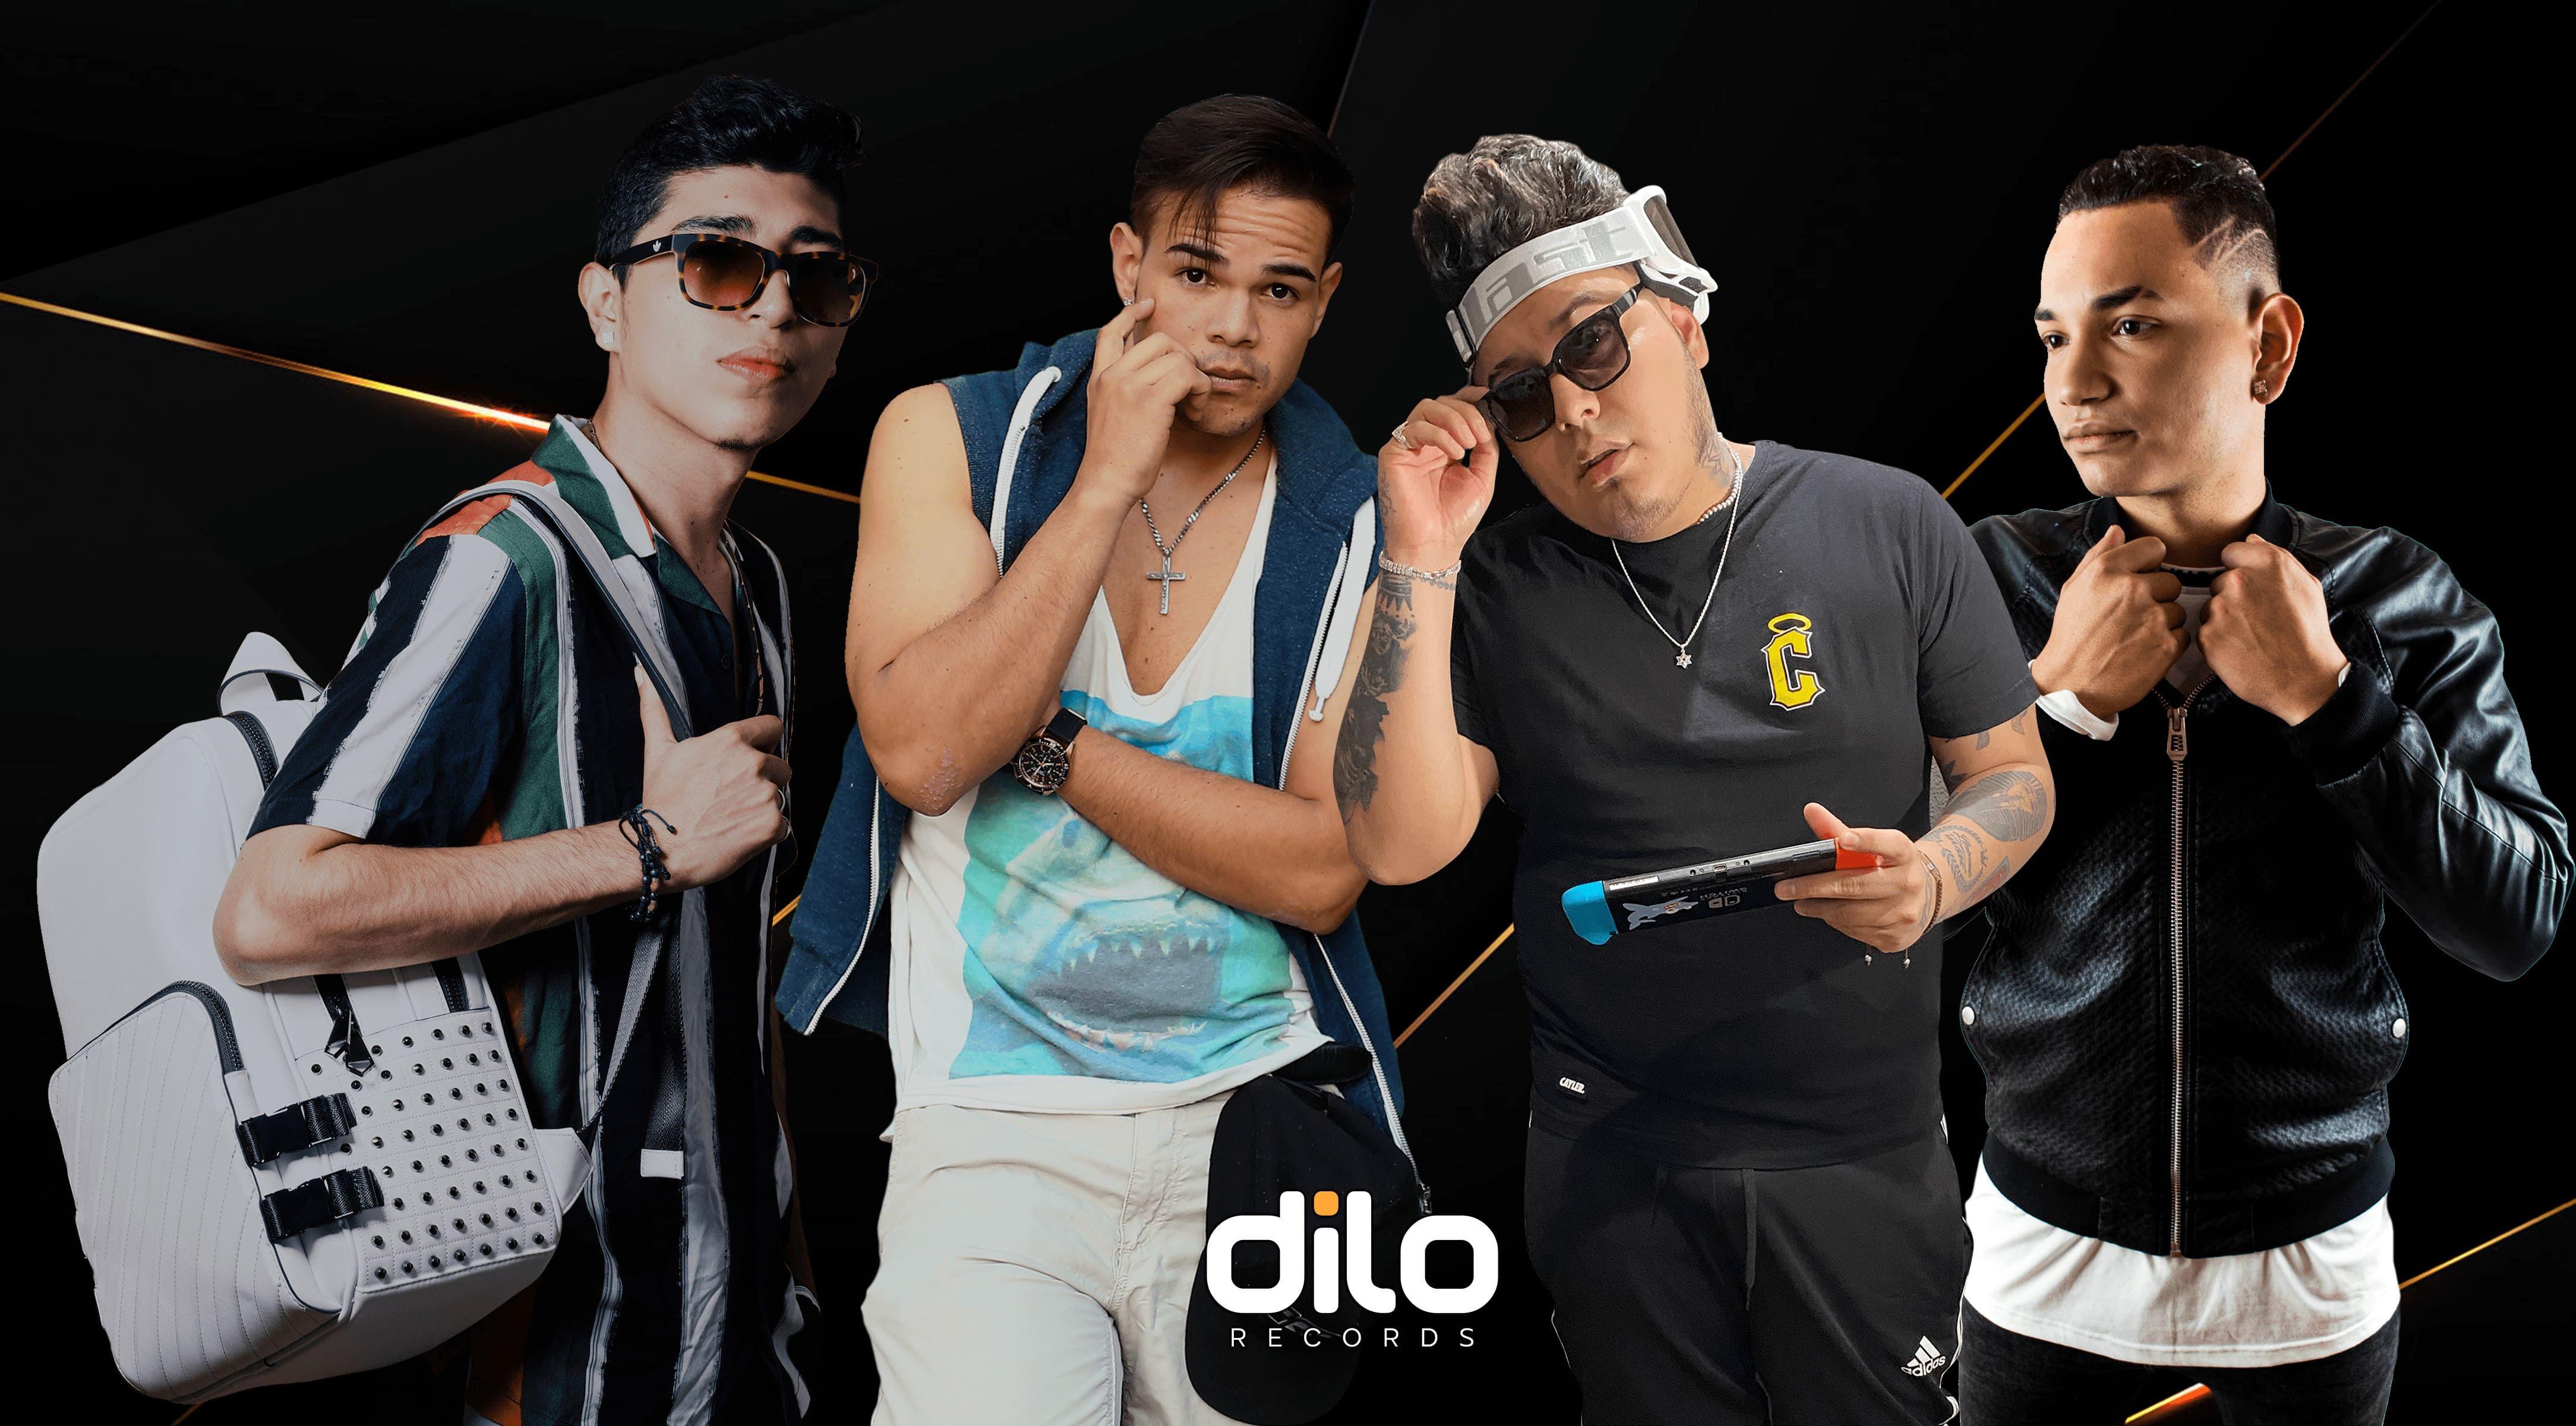 Kaile, el nuevo featuring del sello Dilo Records